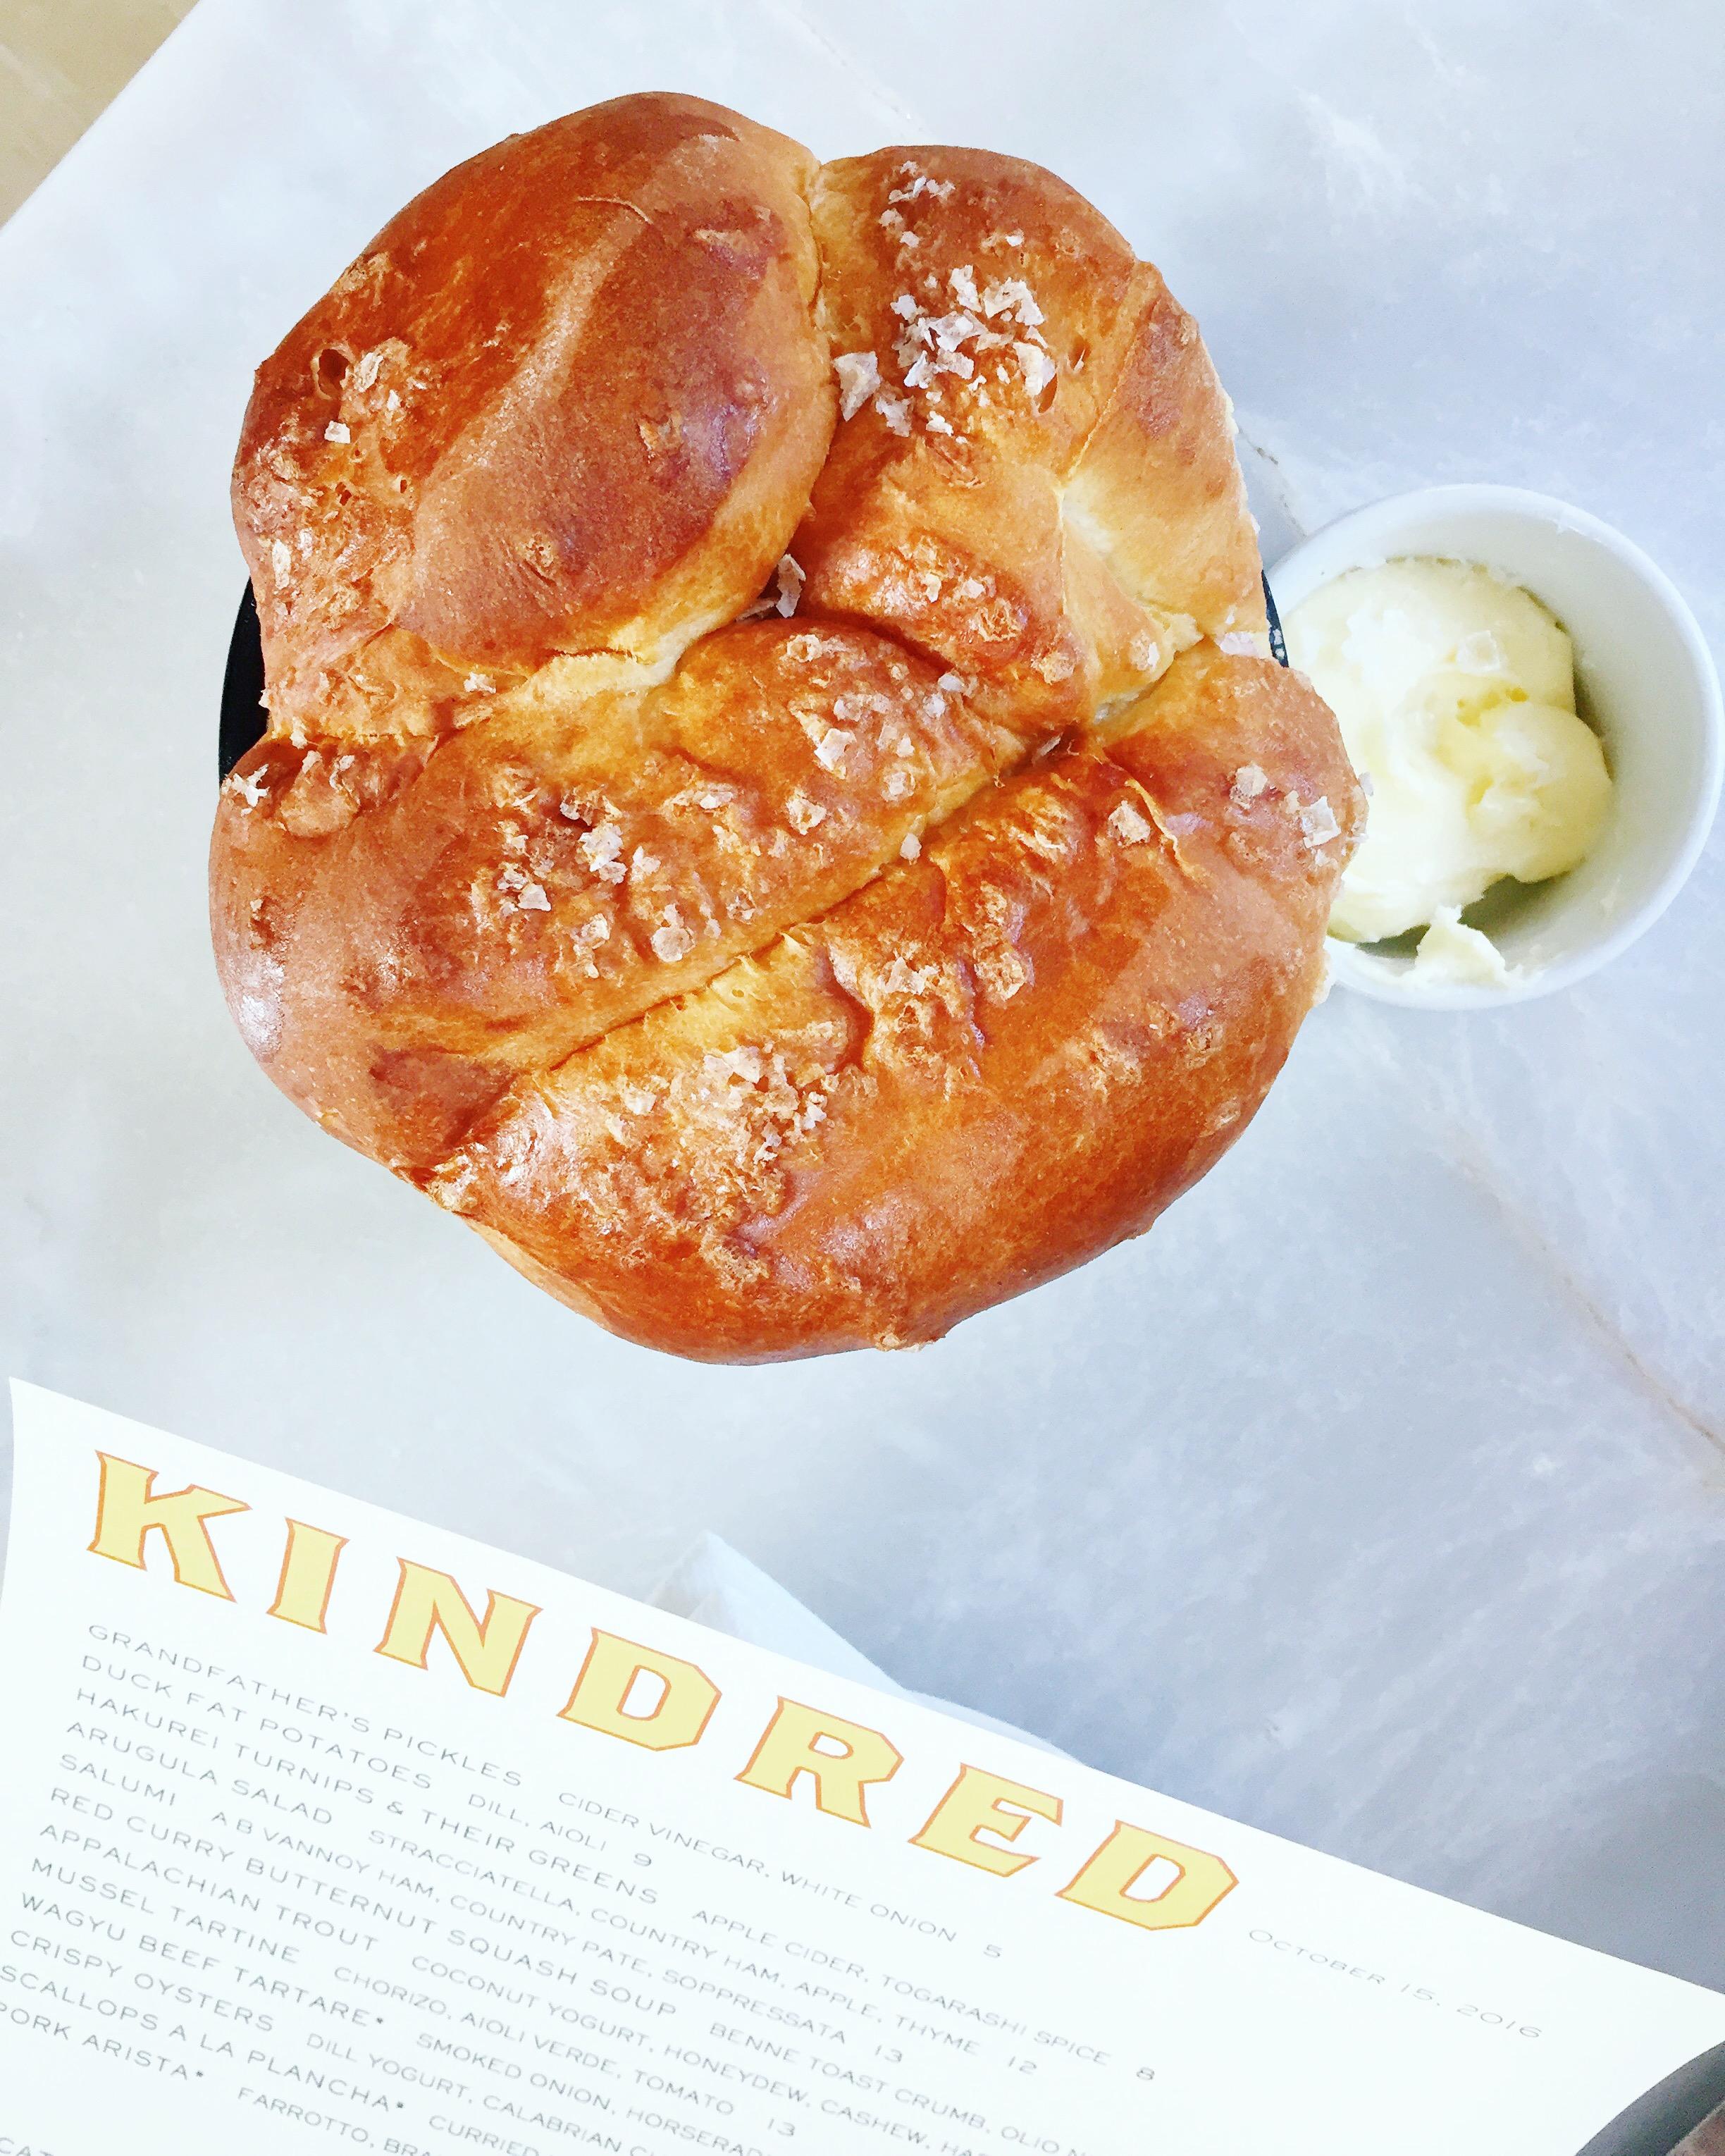 milk-bread-kindred-davidson-nc